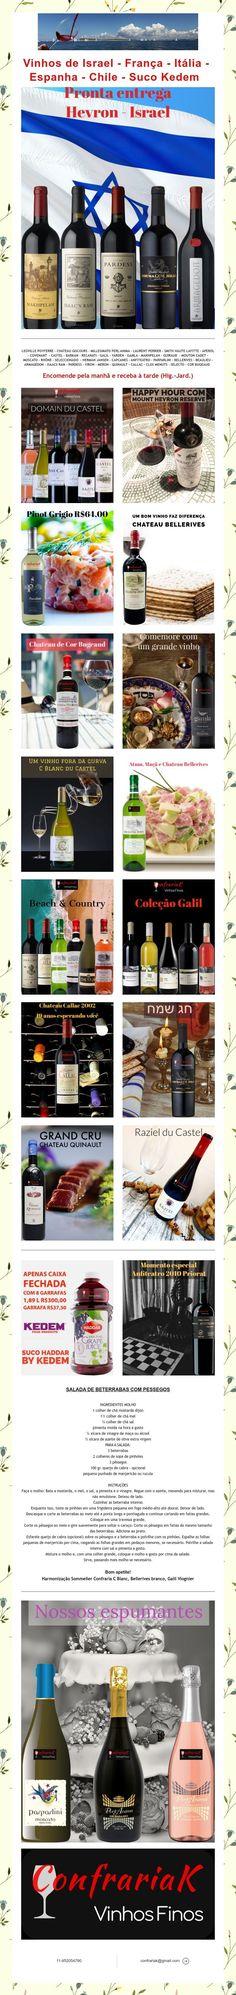 Vinhos de Israel - Suco Kedem Mouton Cadet, Laurent Perrier, Israel, Chile, Juice, Wine Pairings, Spain, Italia, Chili